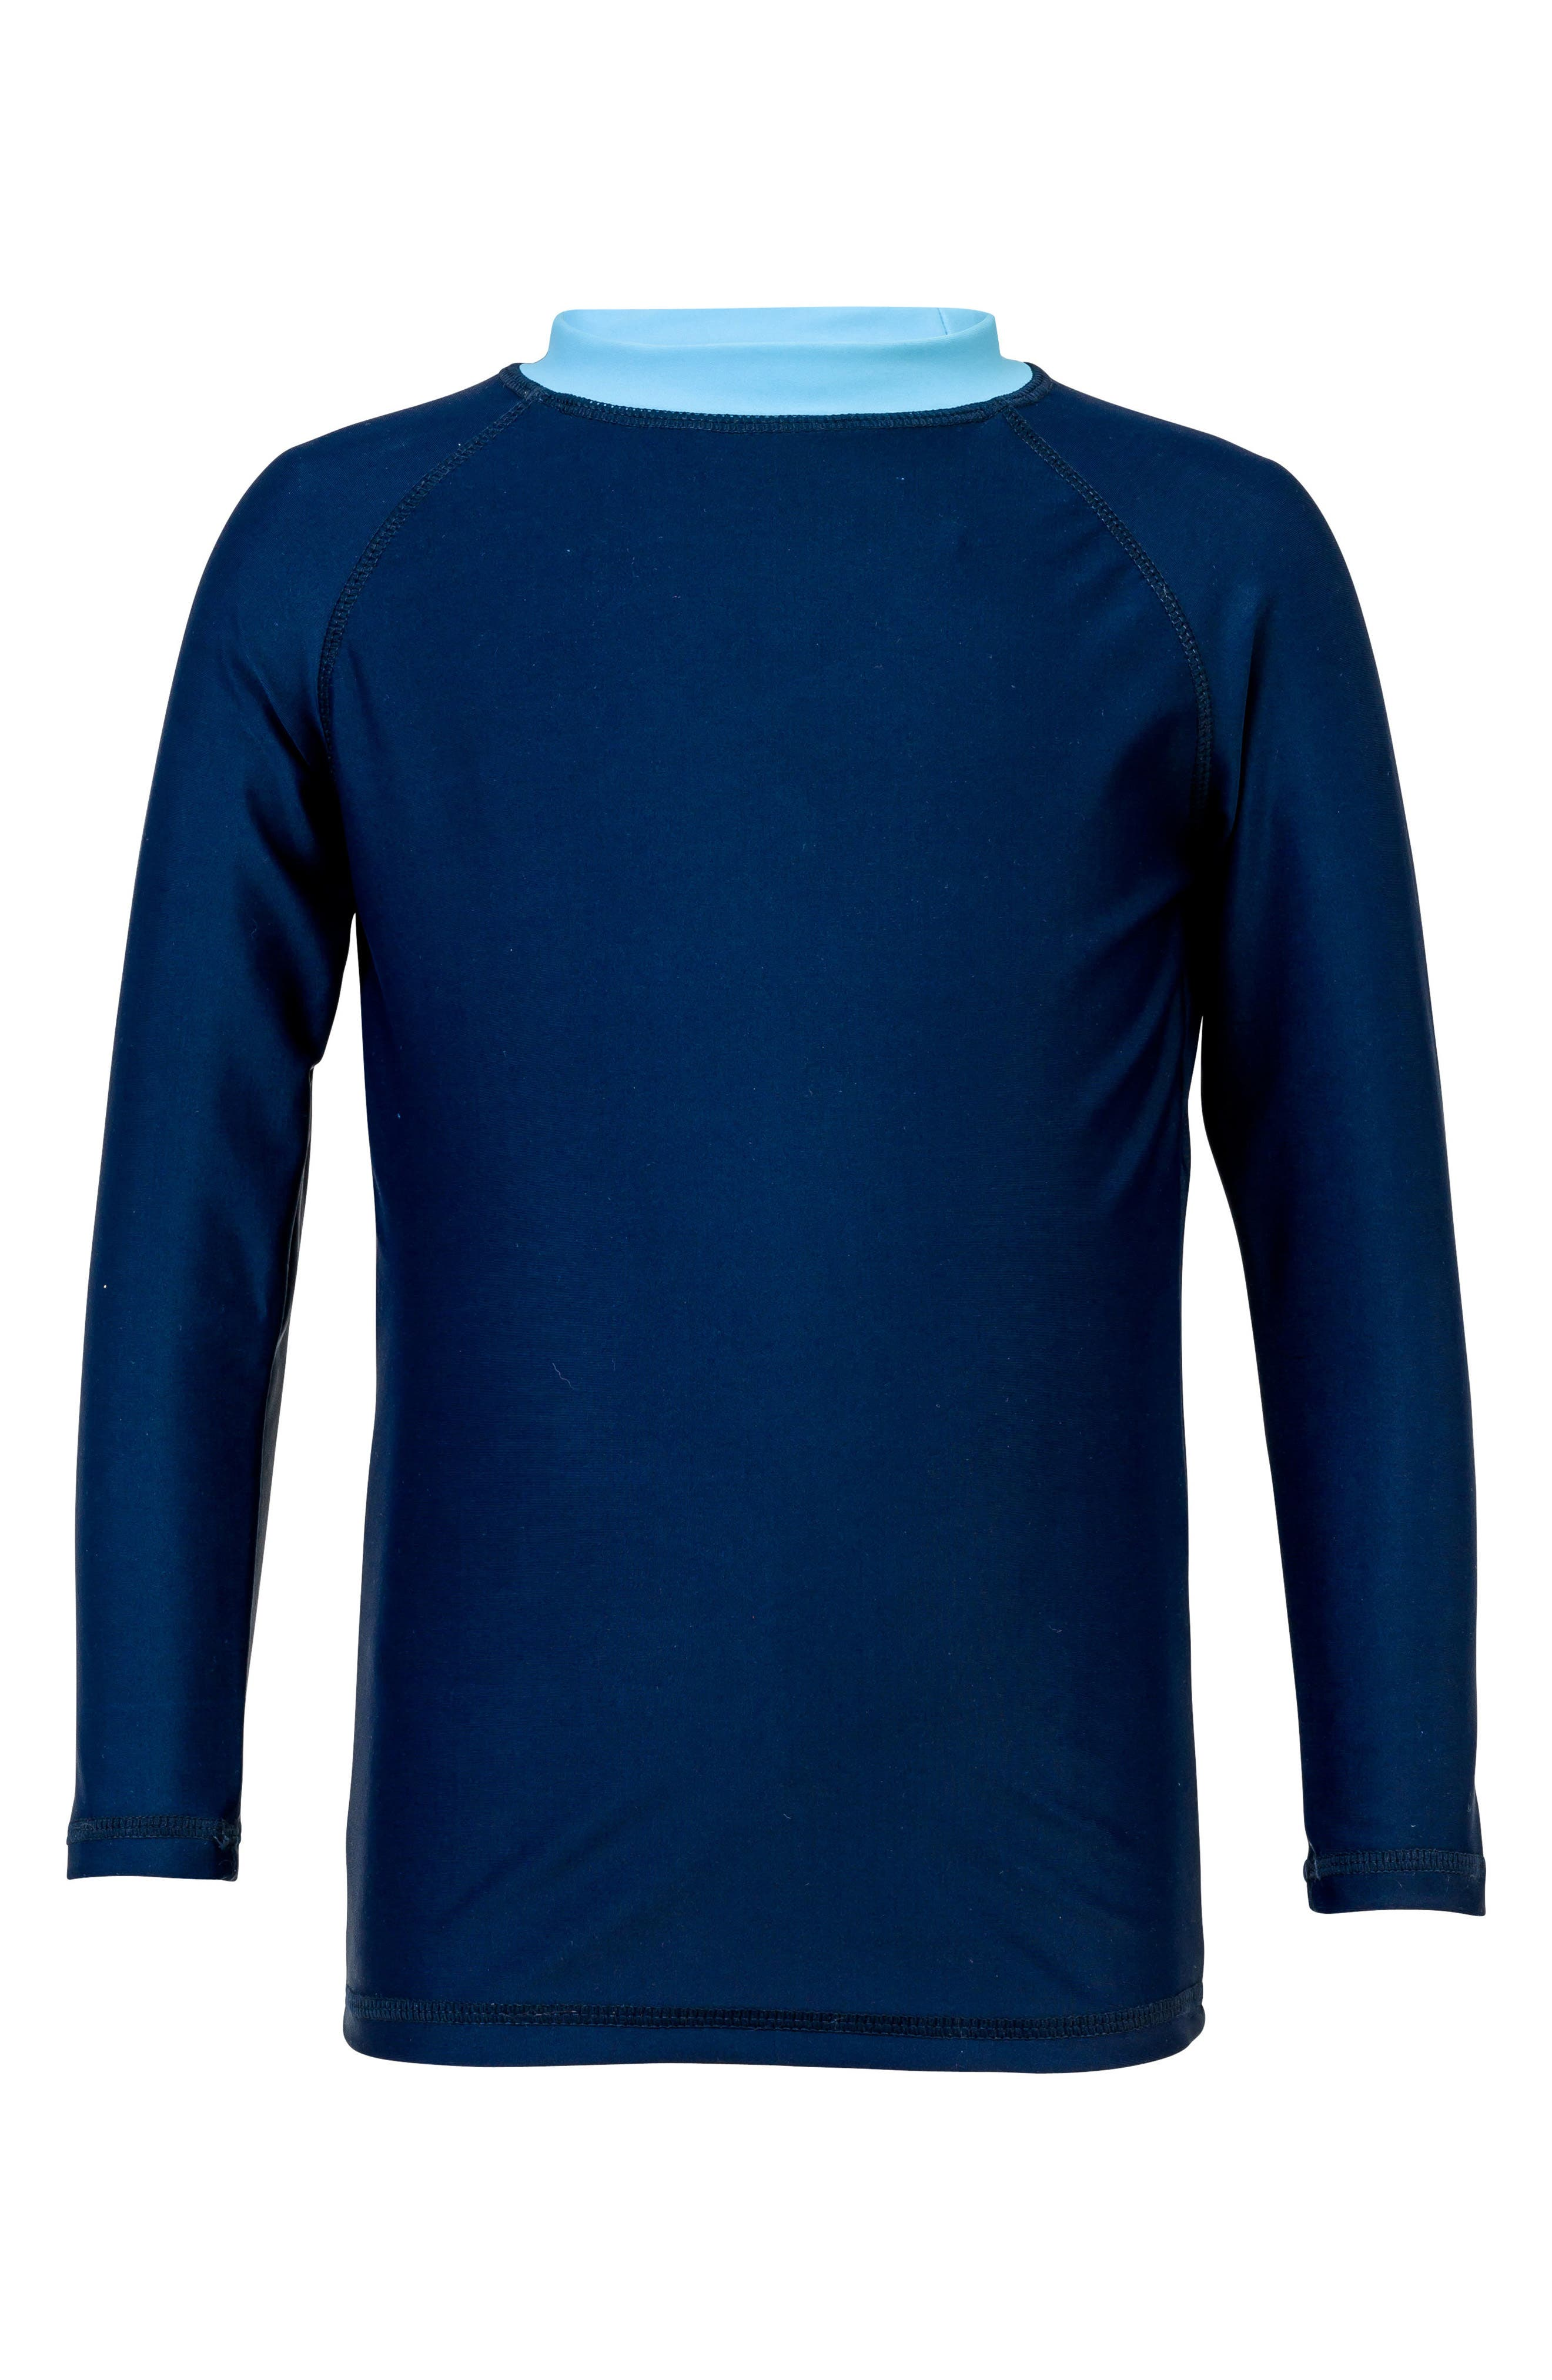 Raglan Long Sleeve Rashguard,                         Main,                         color, Navy